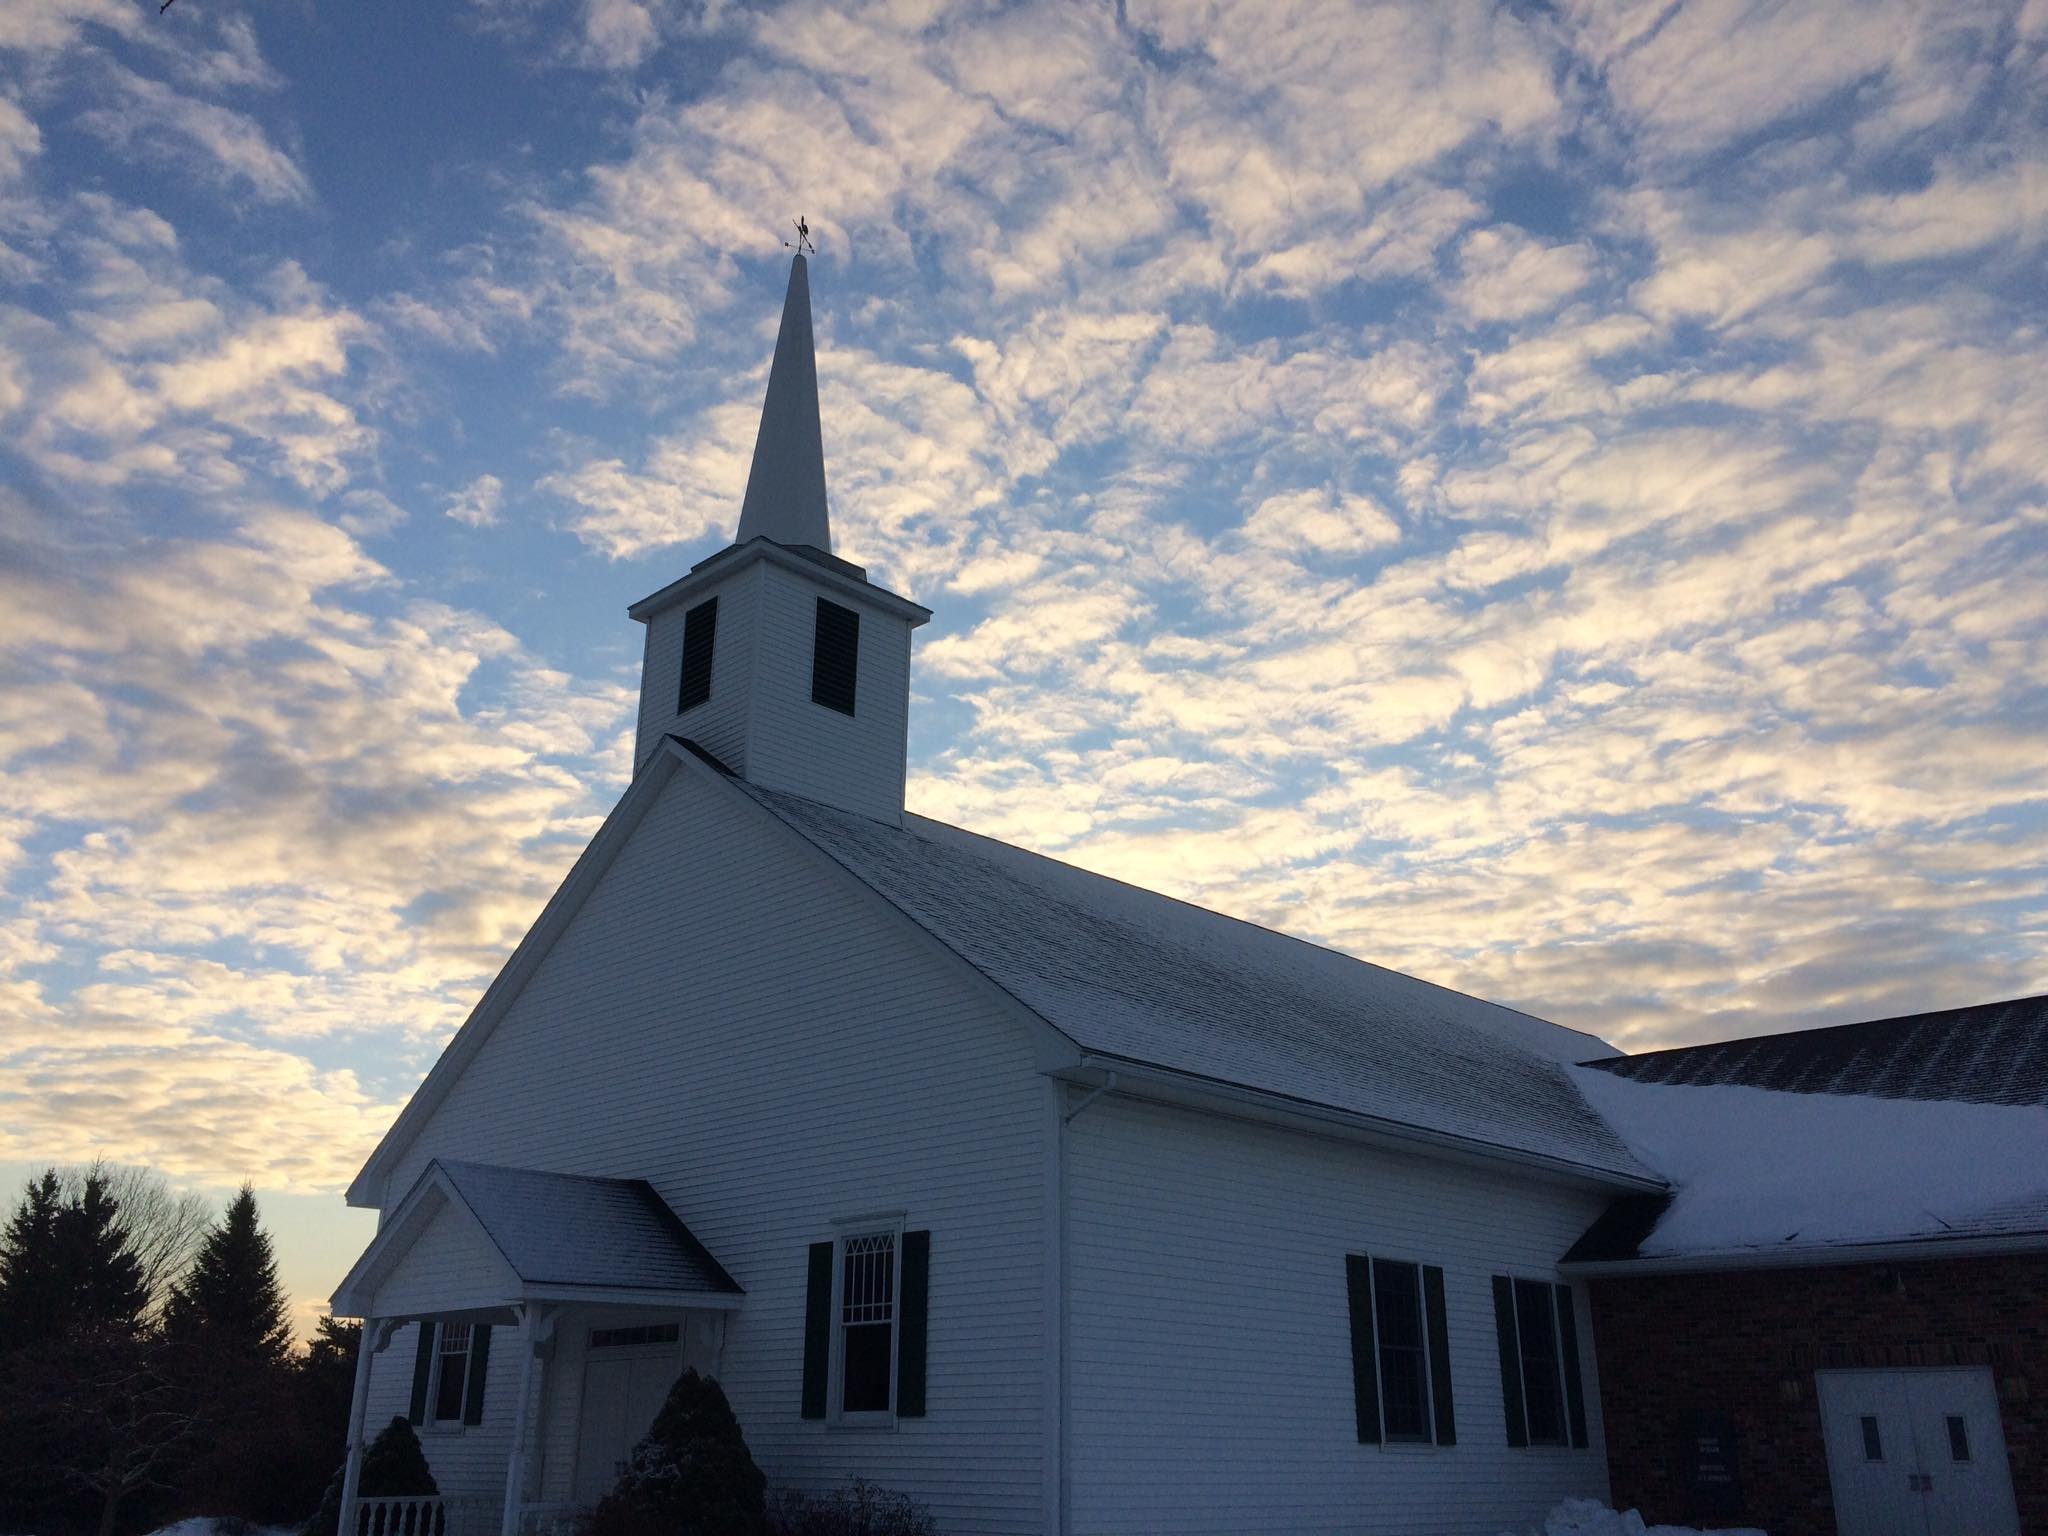 East Orrington Congregational Church